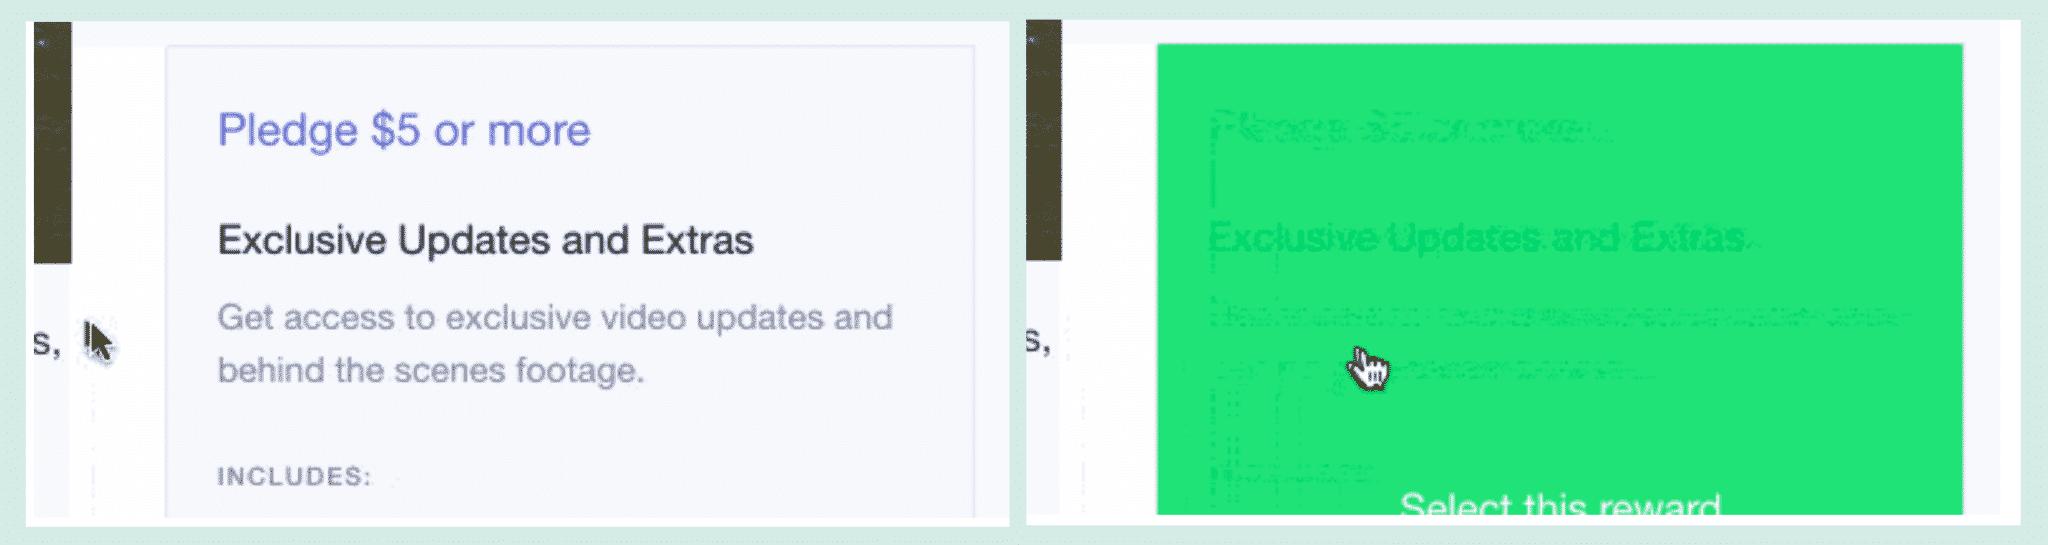 Poor hover contrasts on Kickstarter Pledge page.